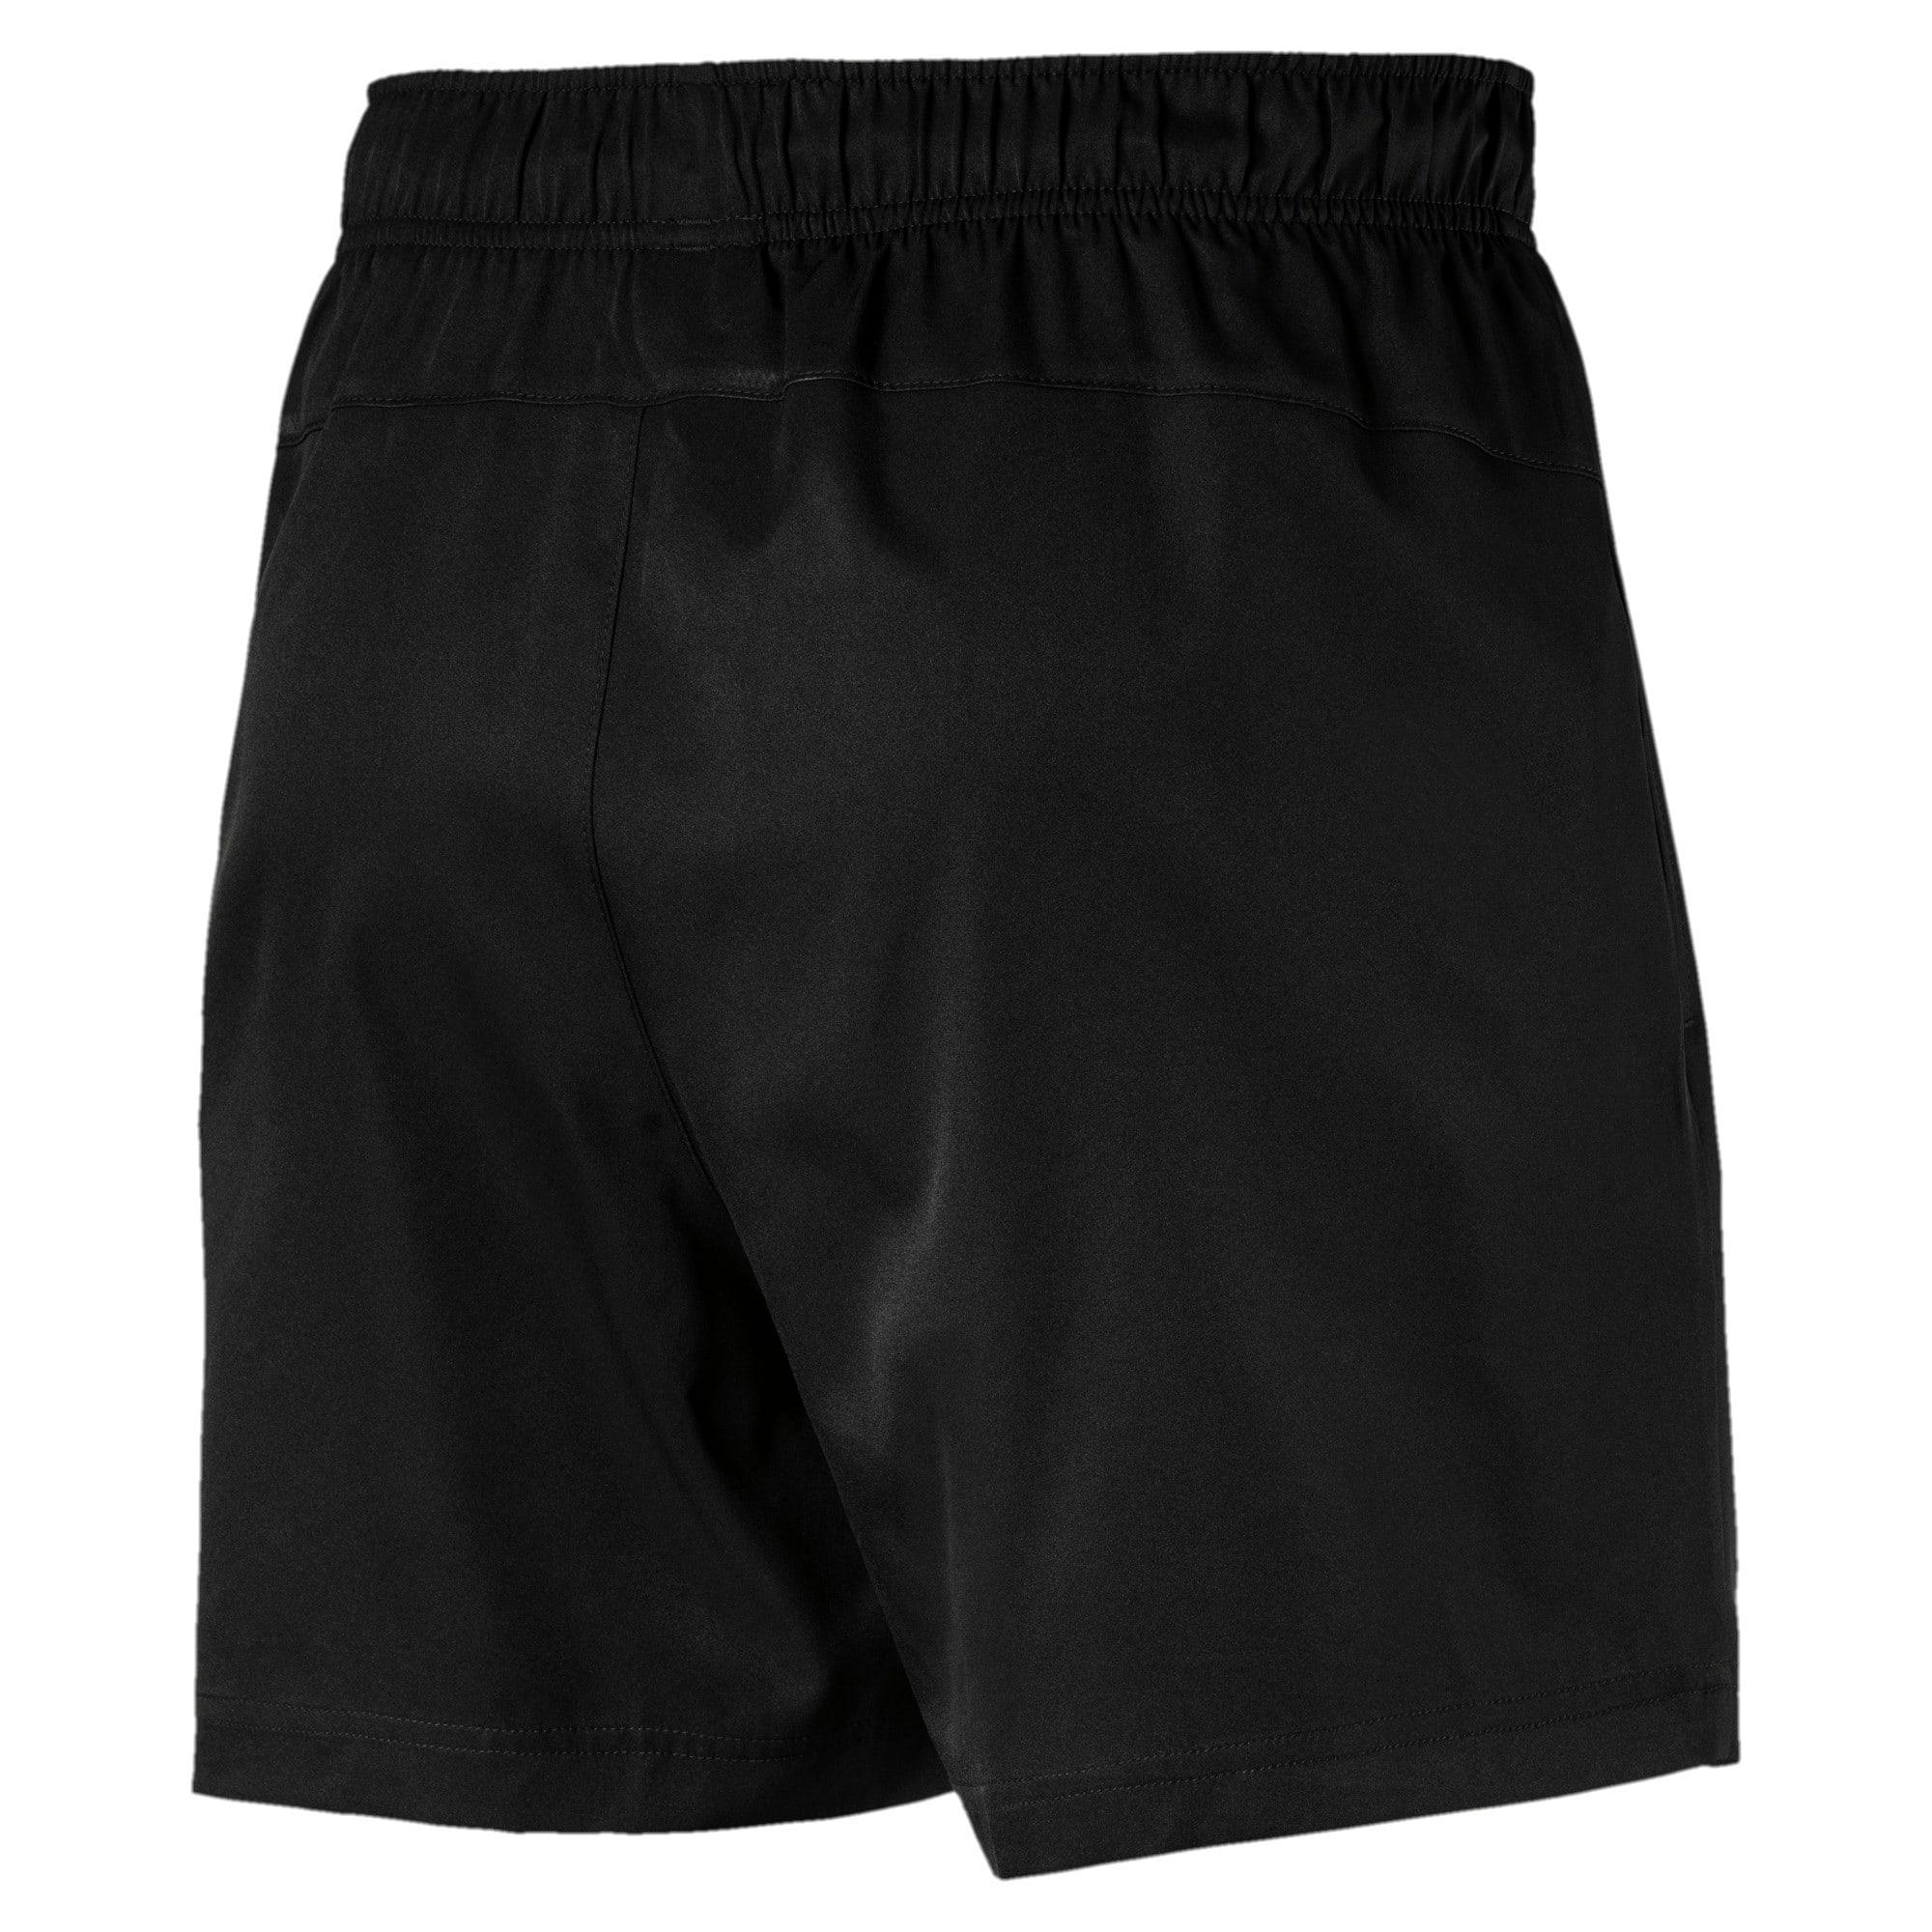 "Thumbnail 5 of Active Woven 5"" Men's Training Shorts, Puma Black, medium"